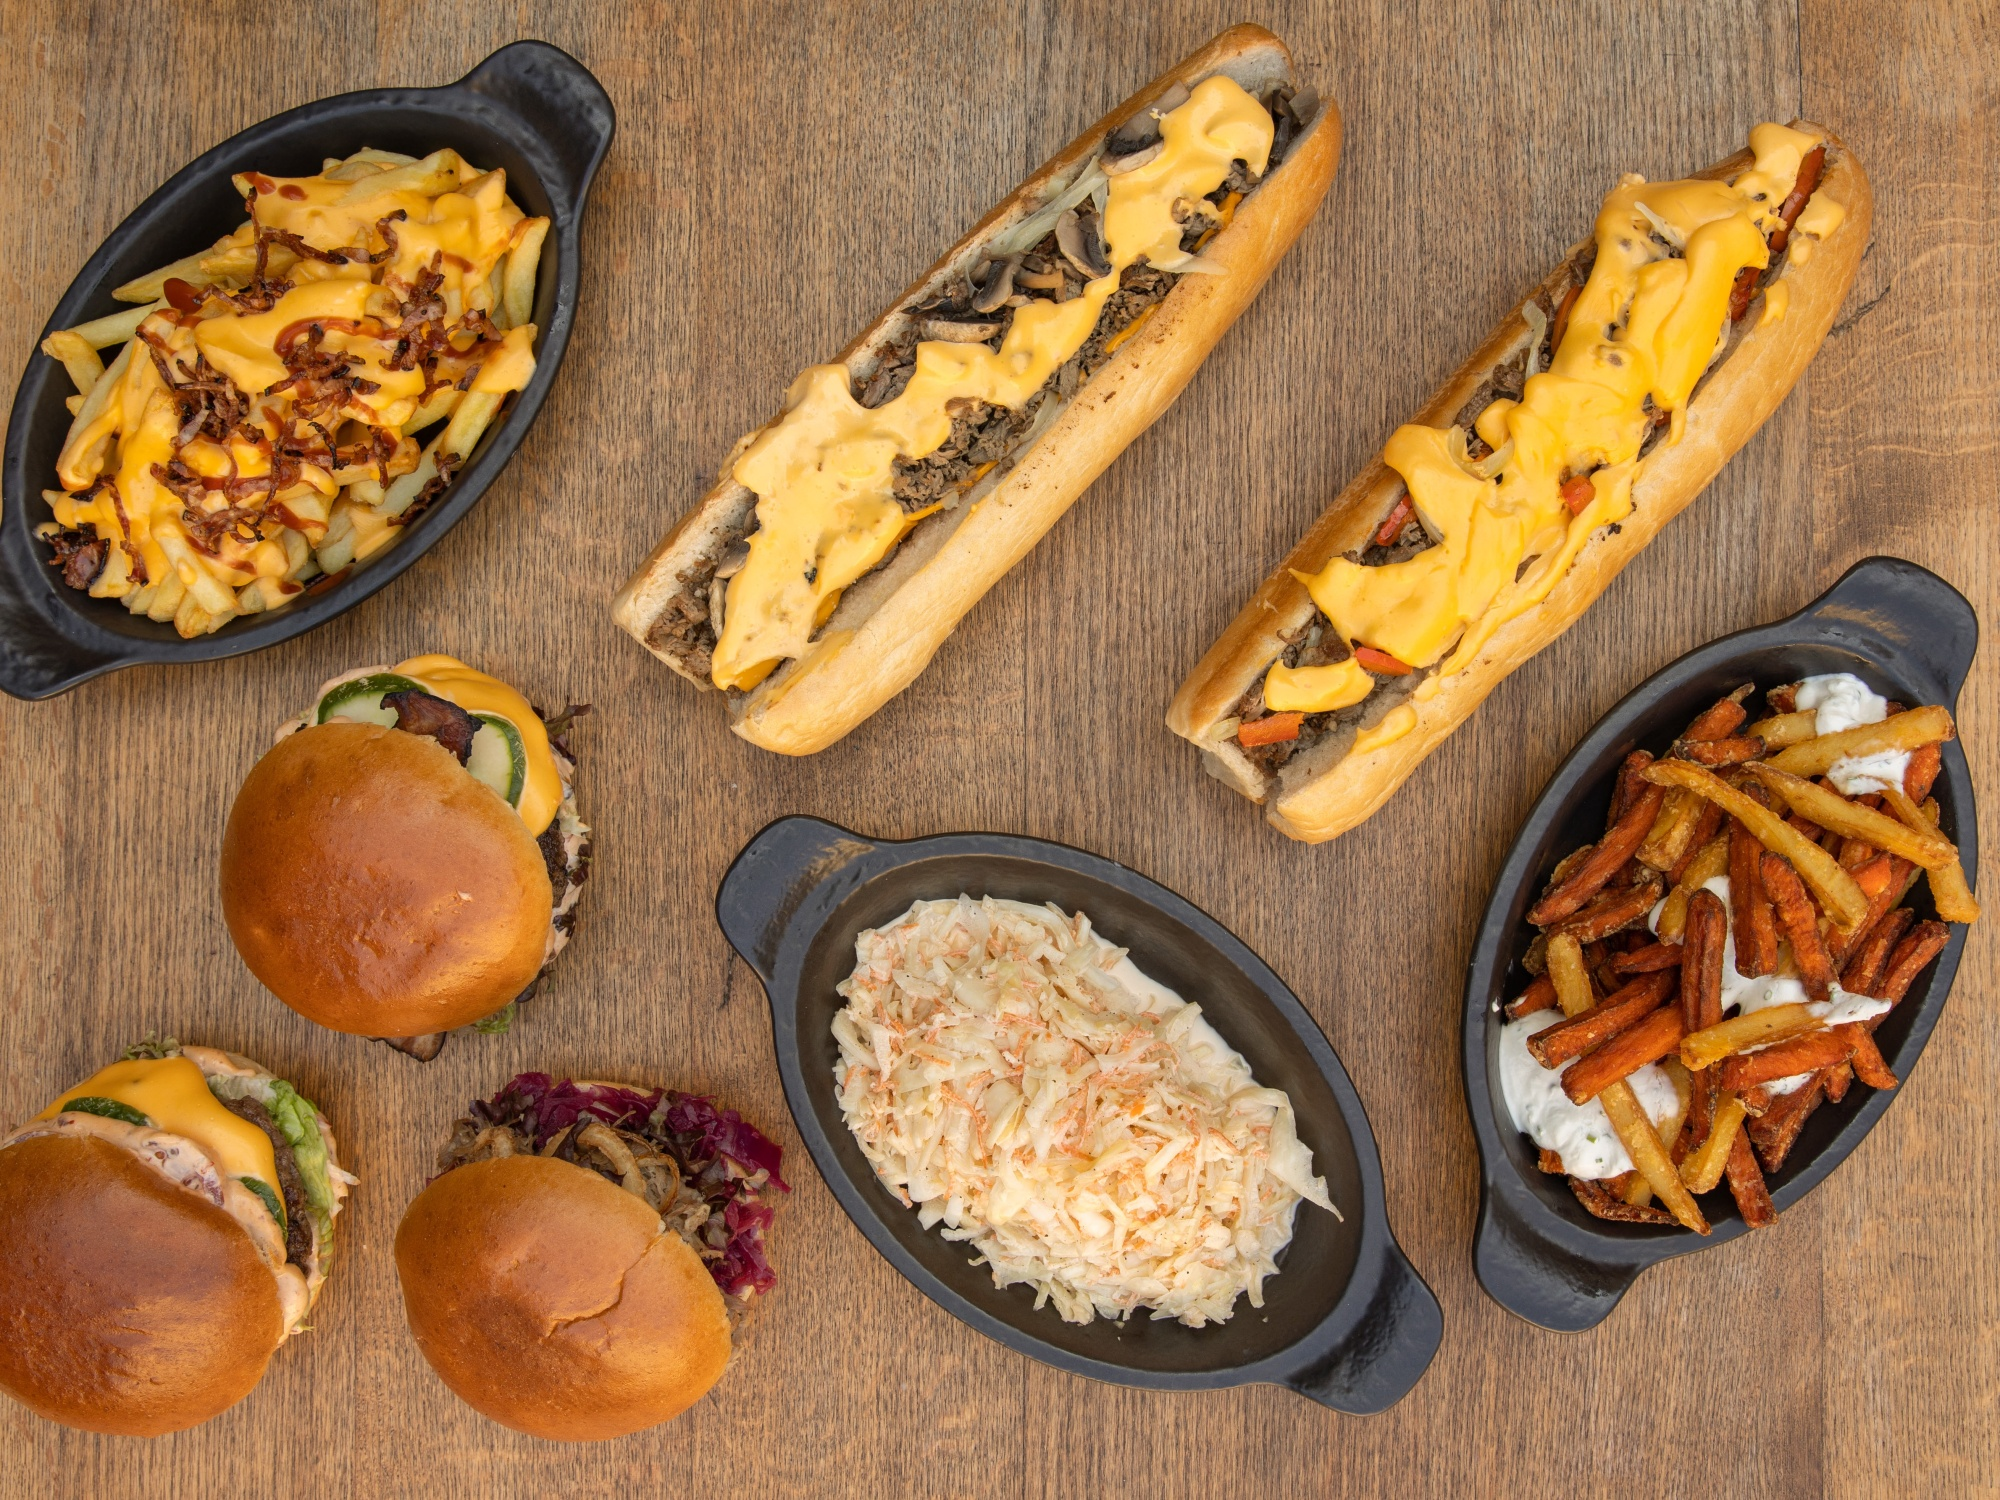 Americký fast food Praha, Burgers, Philly Cheese Steaks